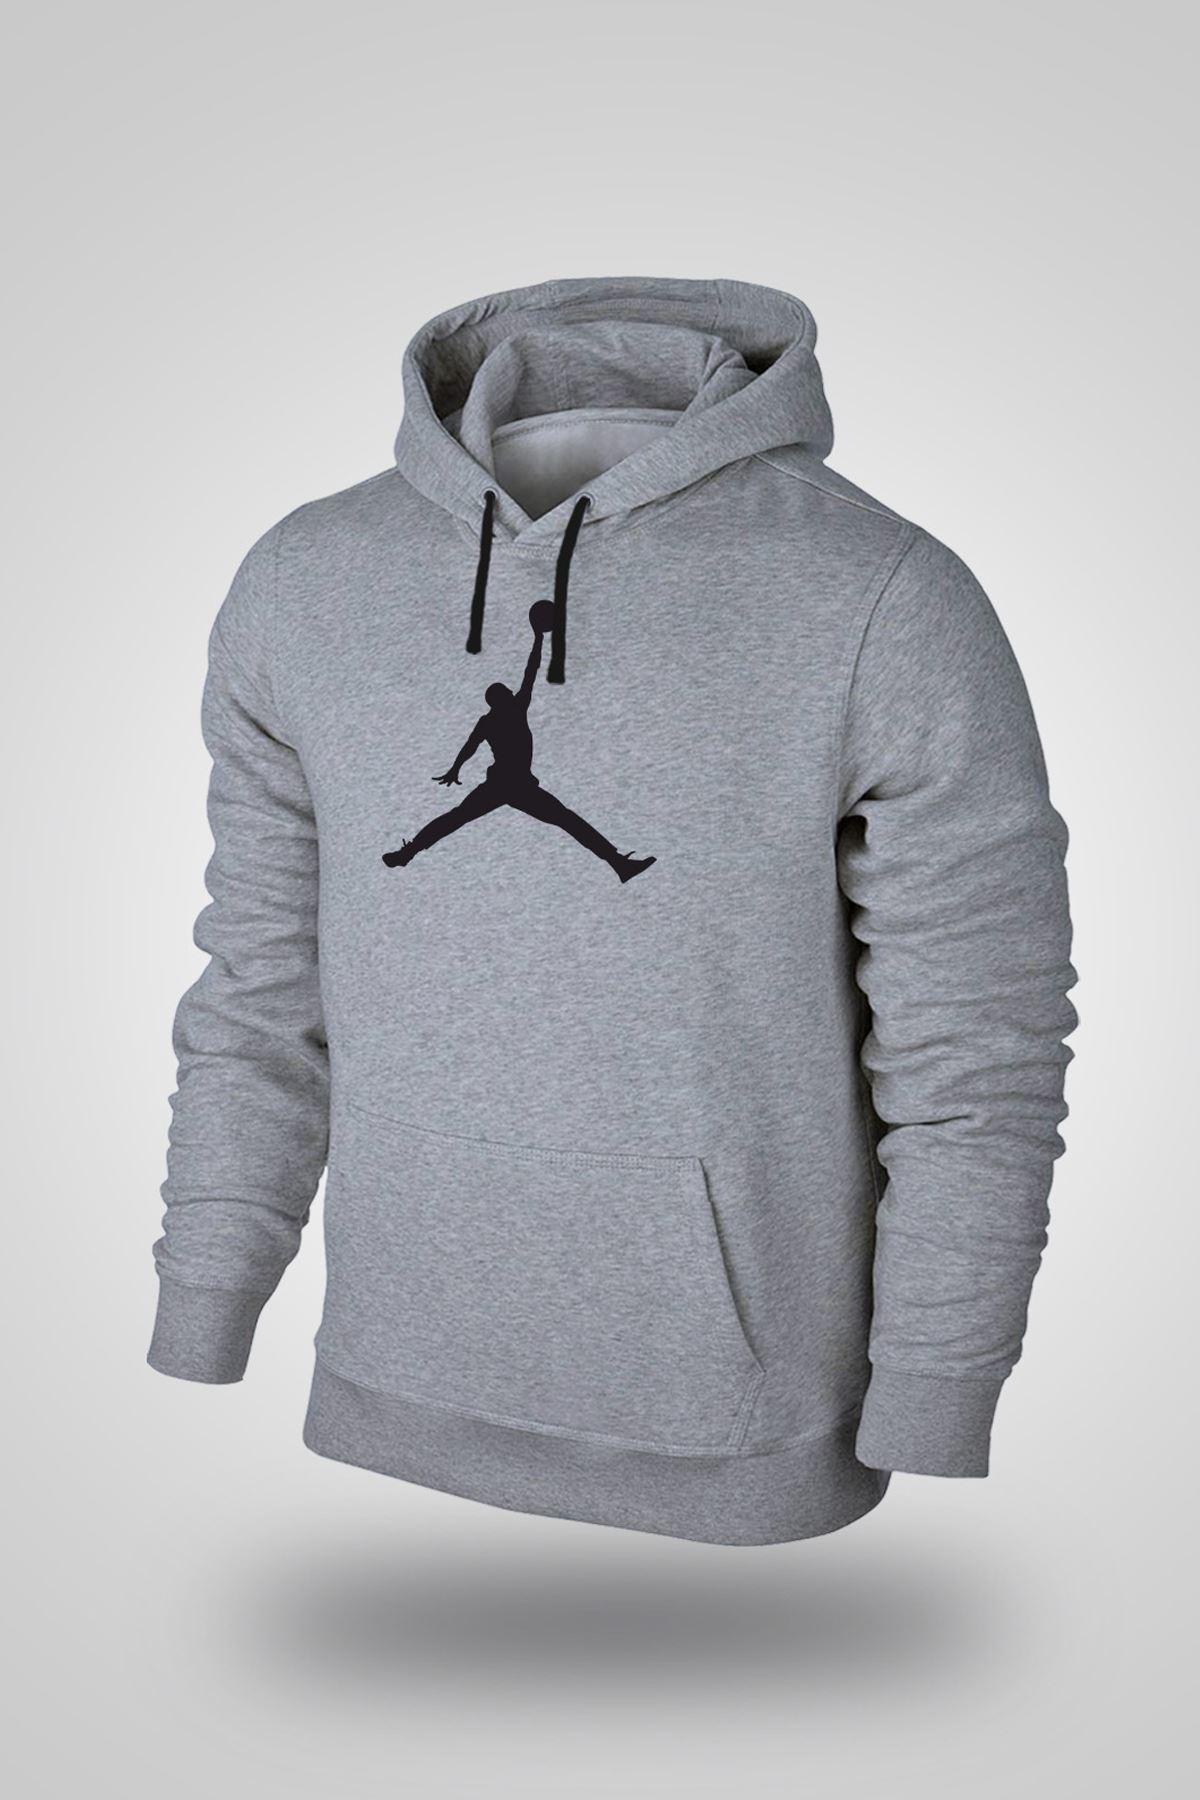 Air Jordan 02 Gri NBA Erkek Kapşonlu Sweatshirt - Hoodie